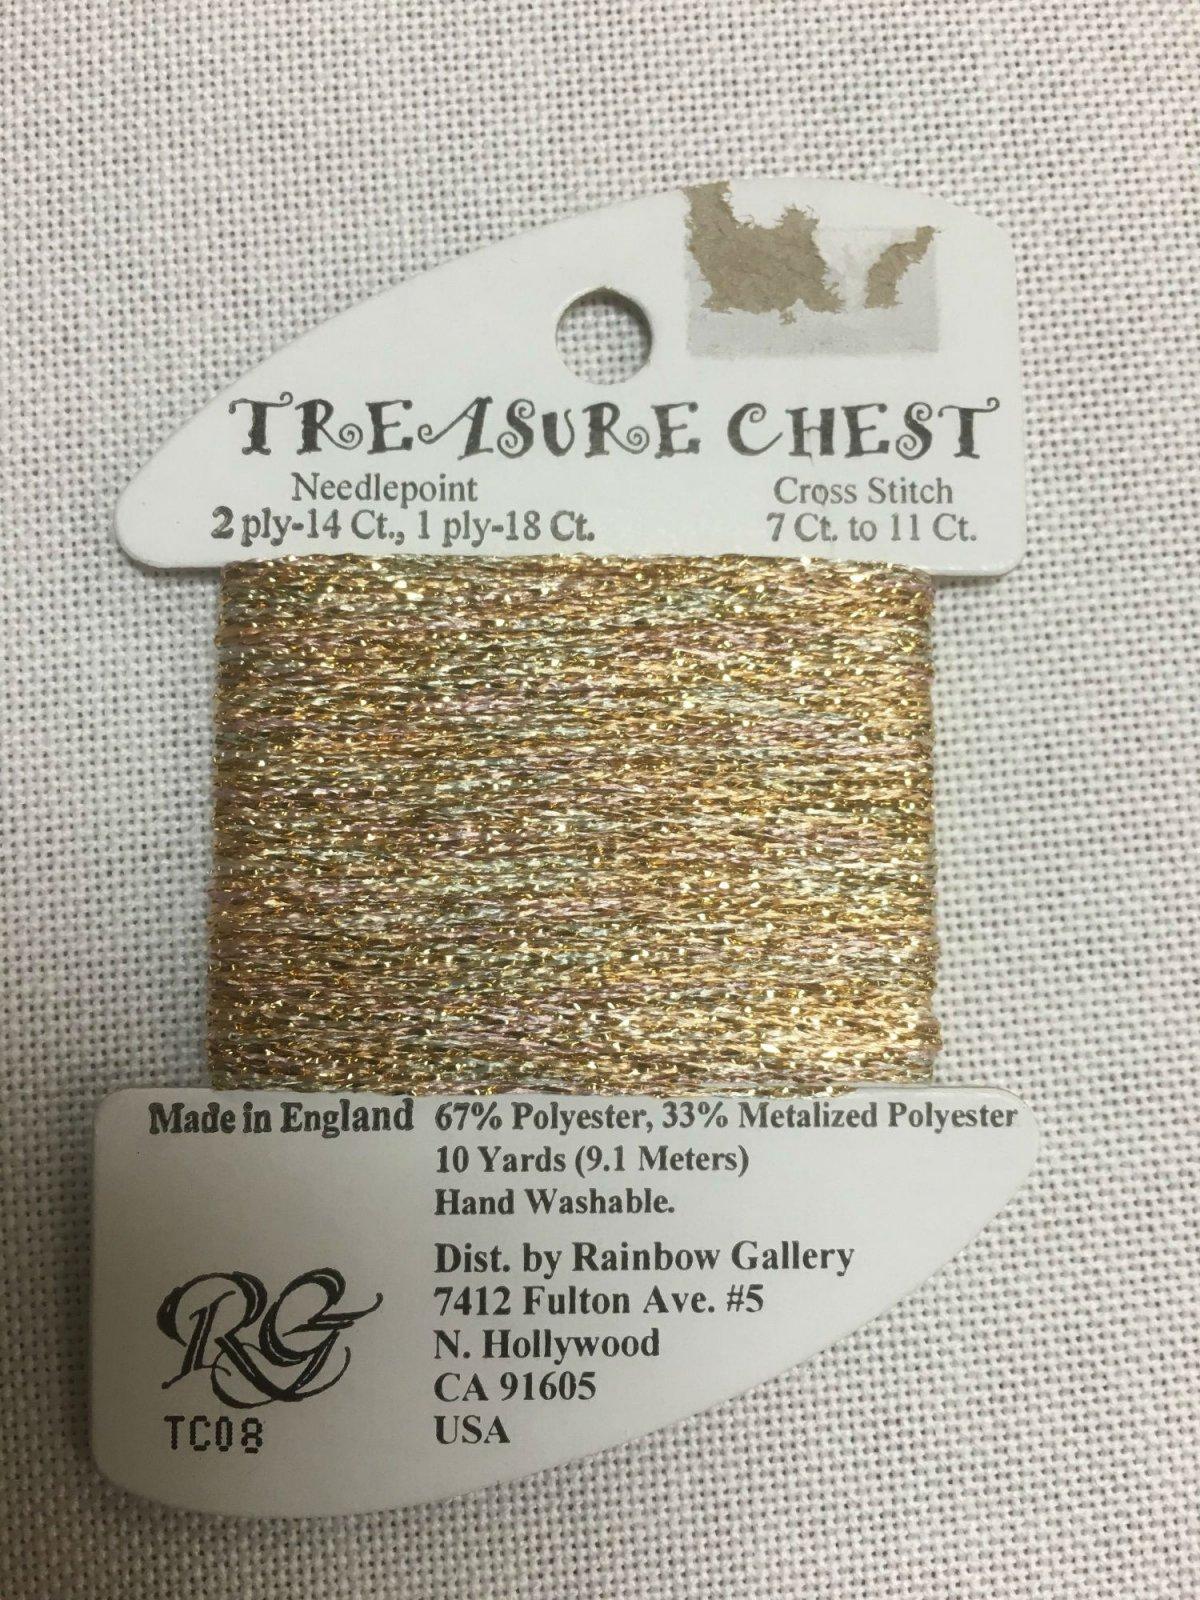 Treasure Chest TC08